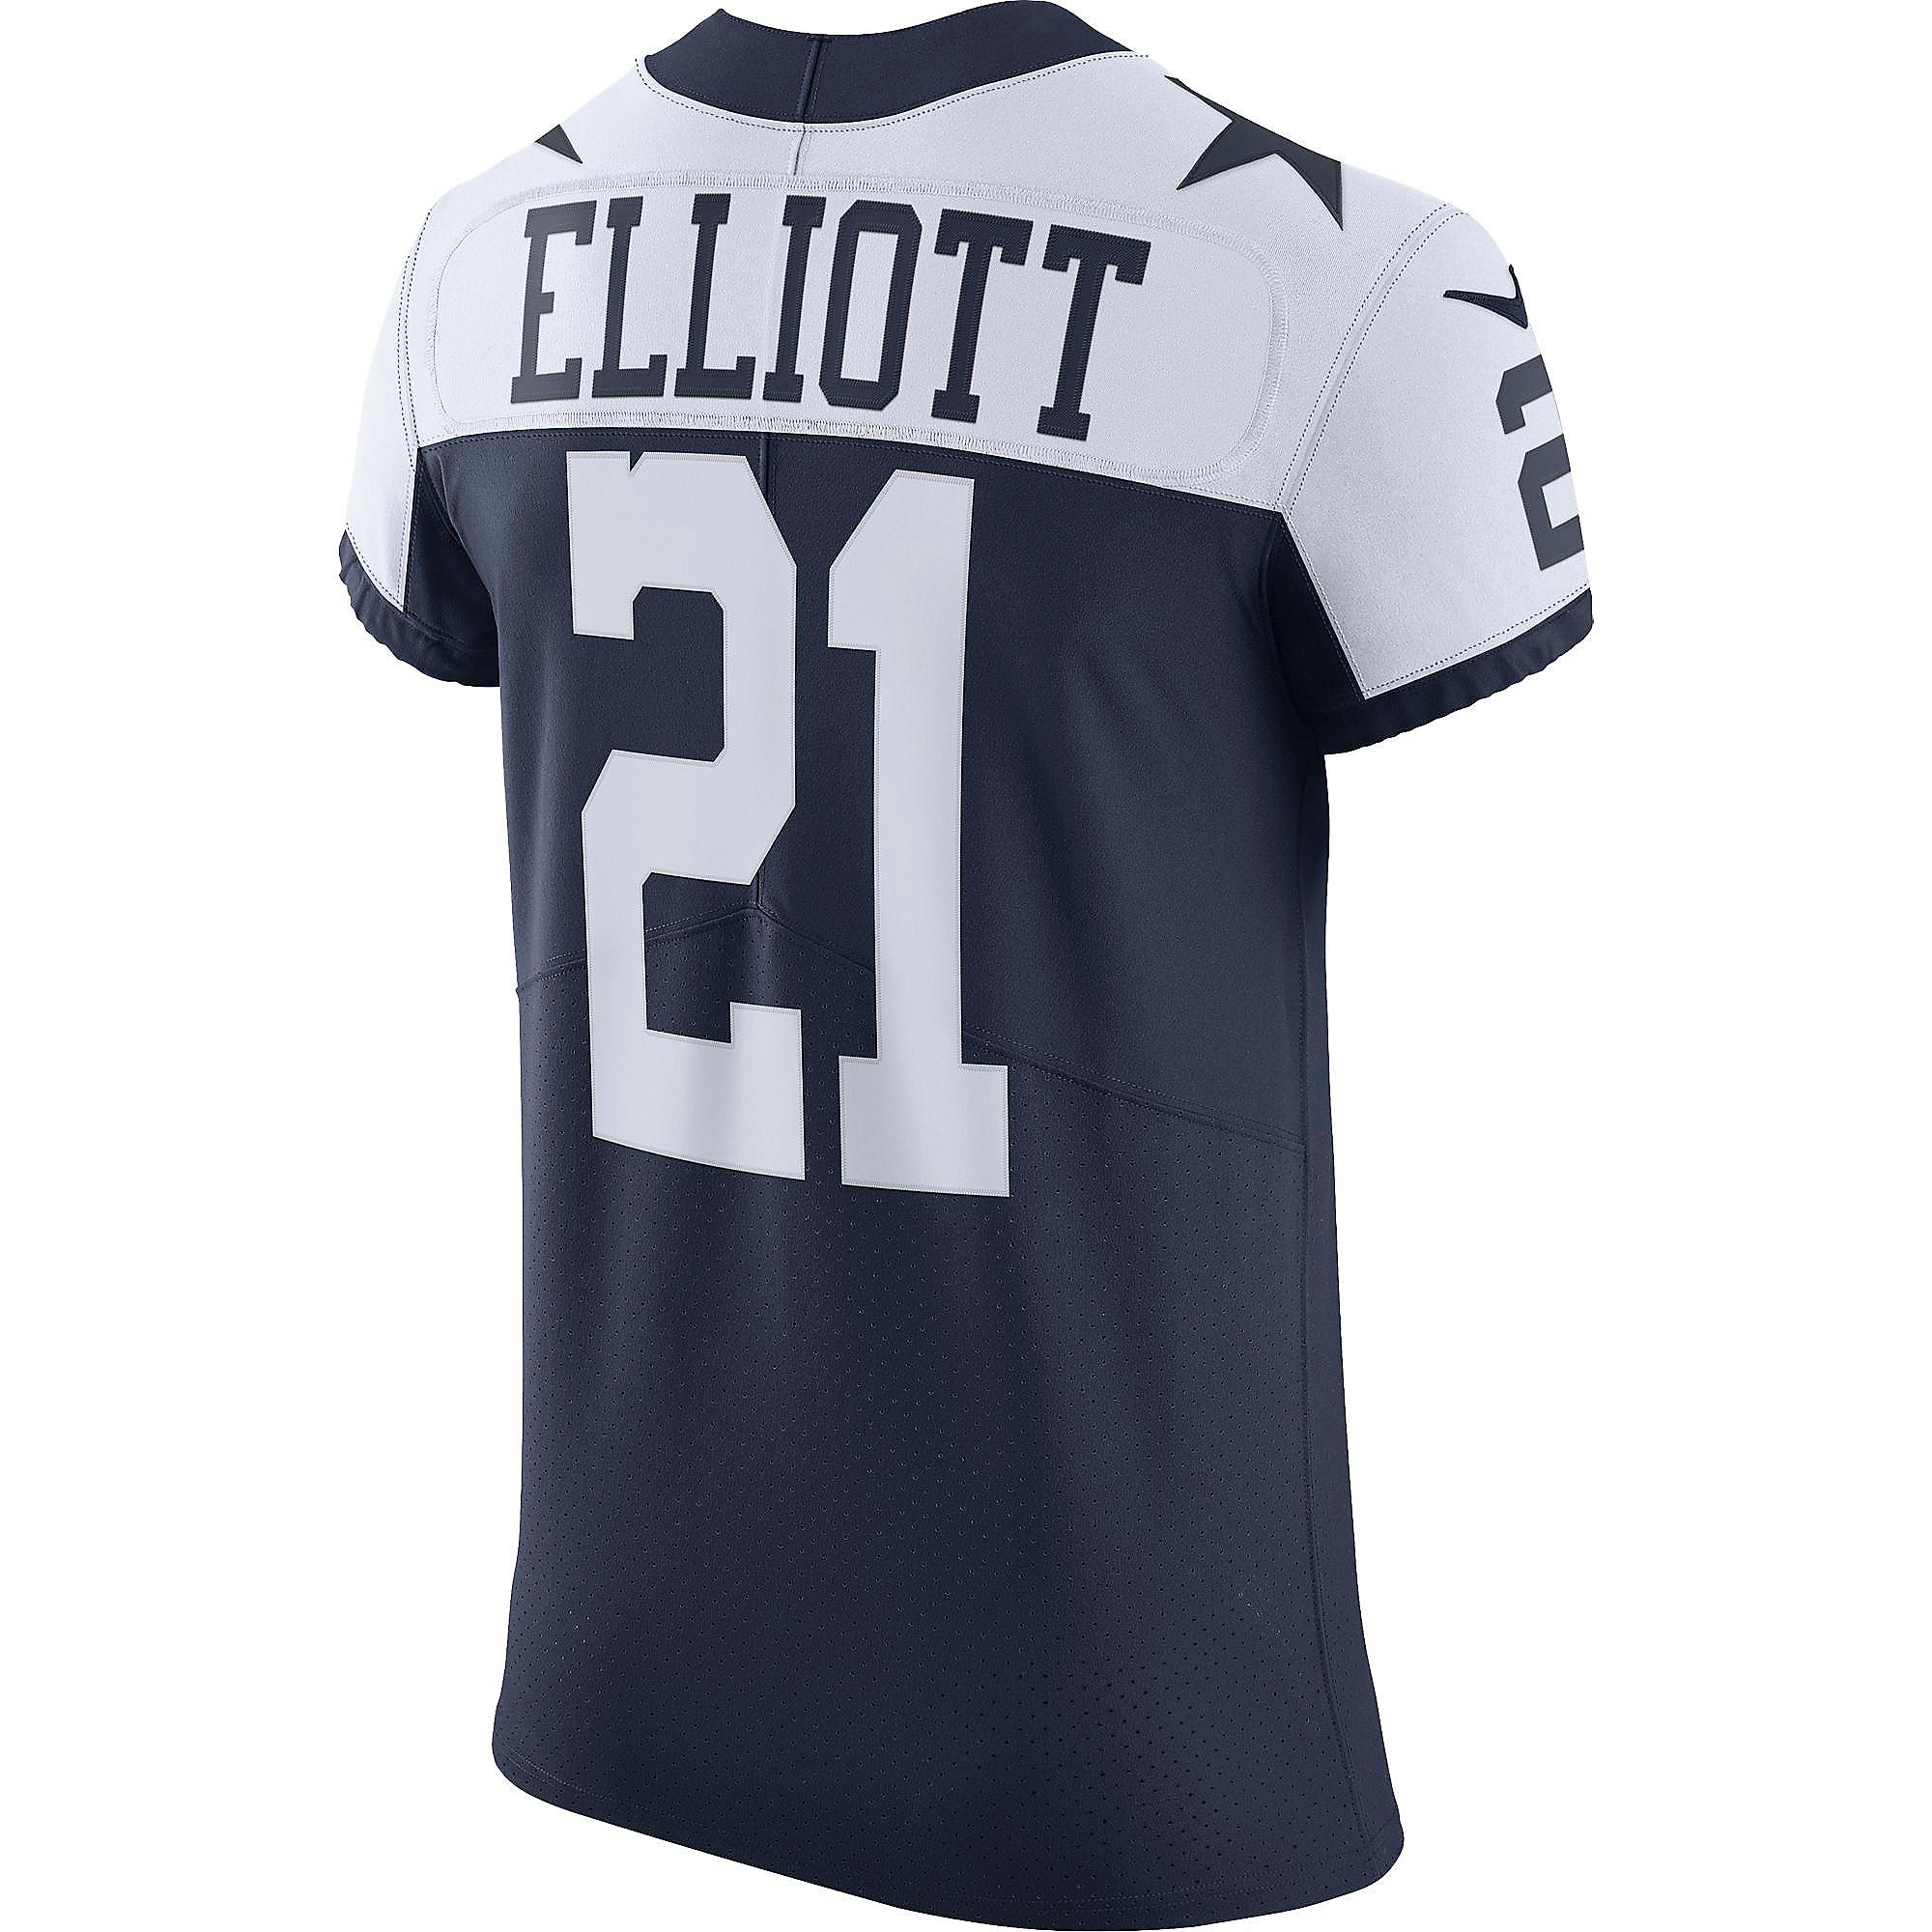 Dallas Cowboys Ezekiel Elliott #21 Nike Vapor Elite Authentic Throwback Jersey